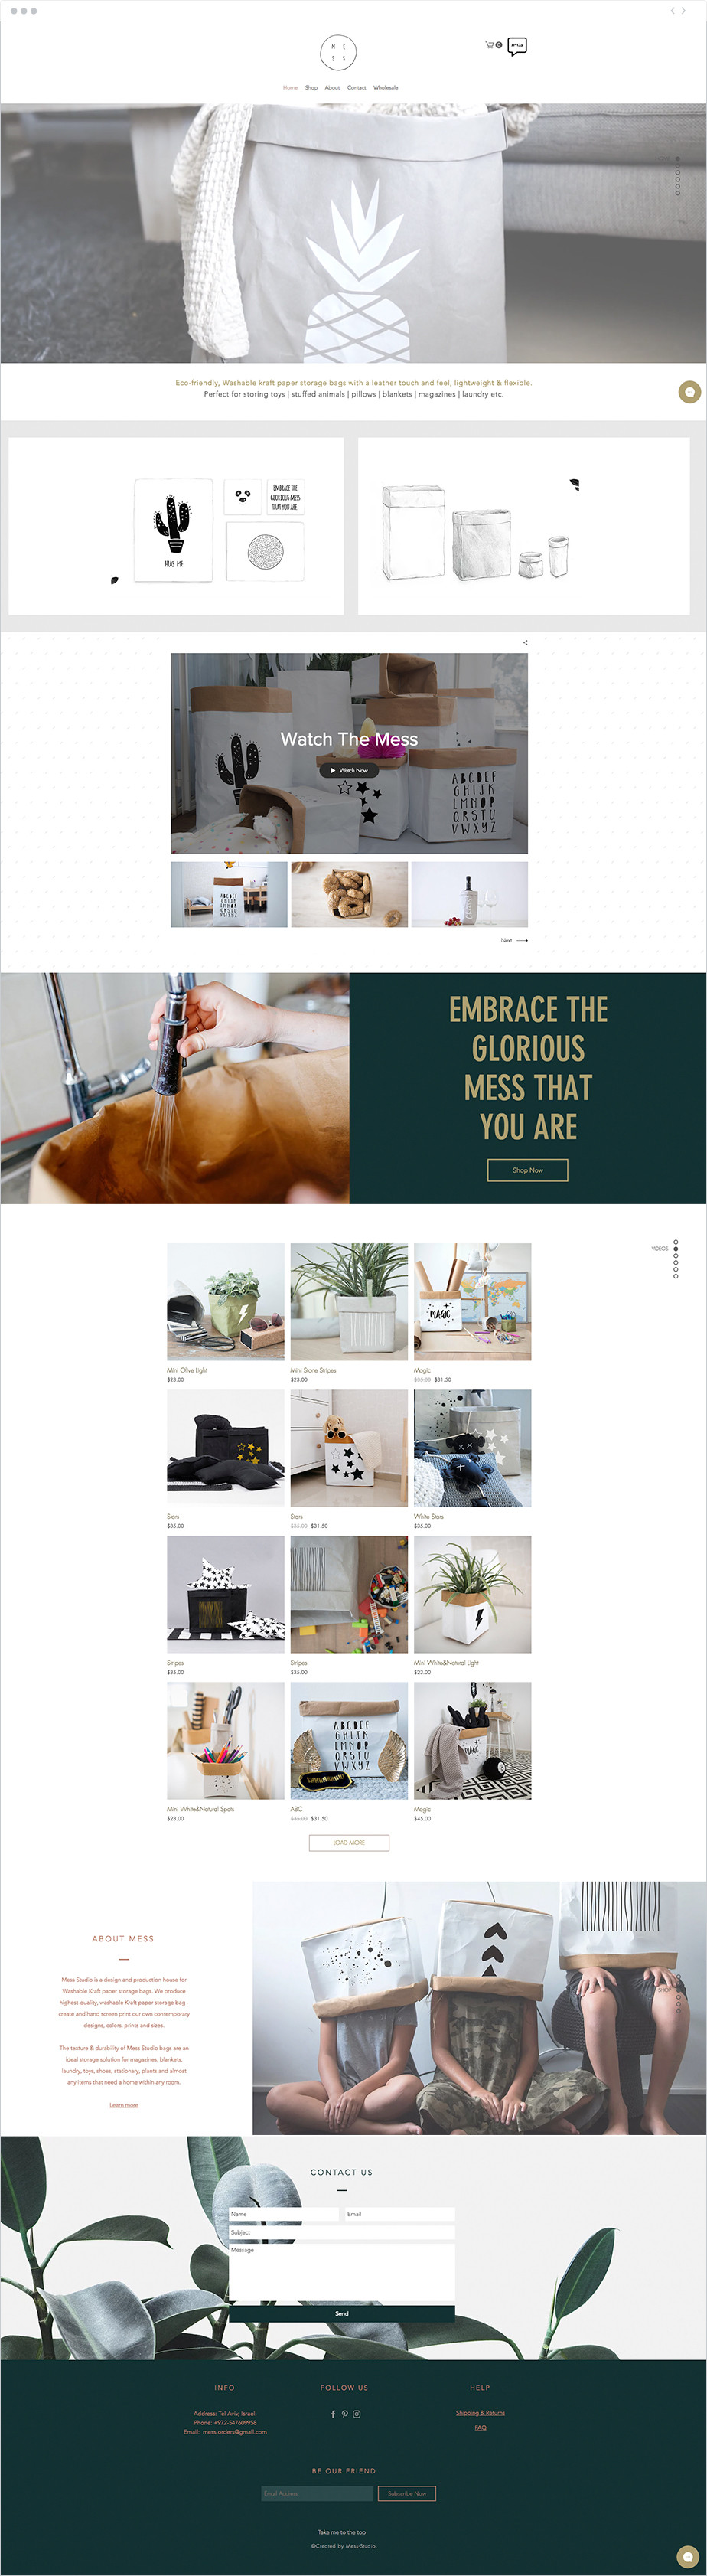 Exemple de site one-page - Mess Studio